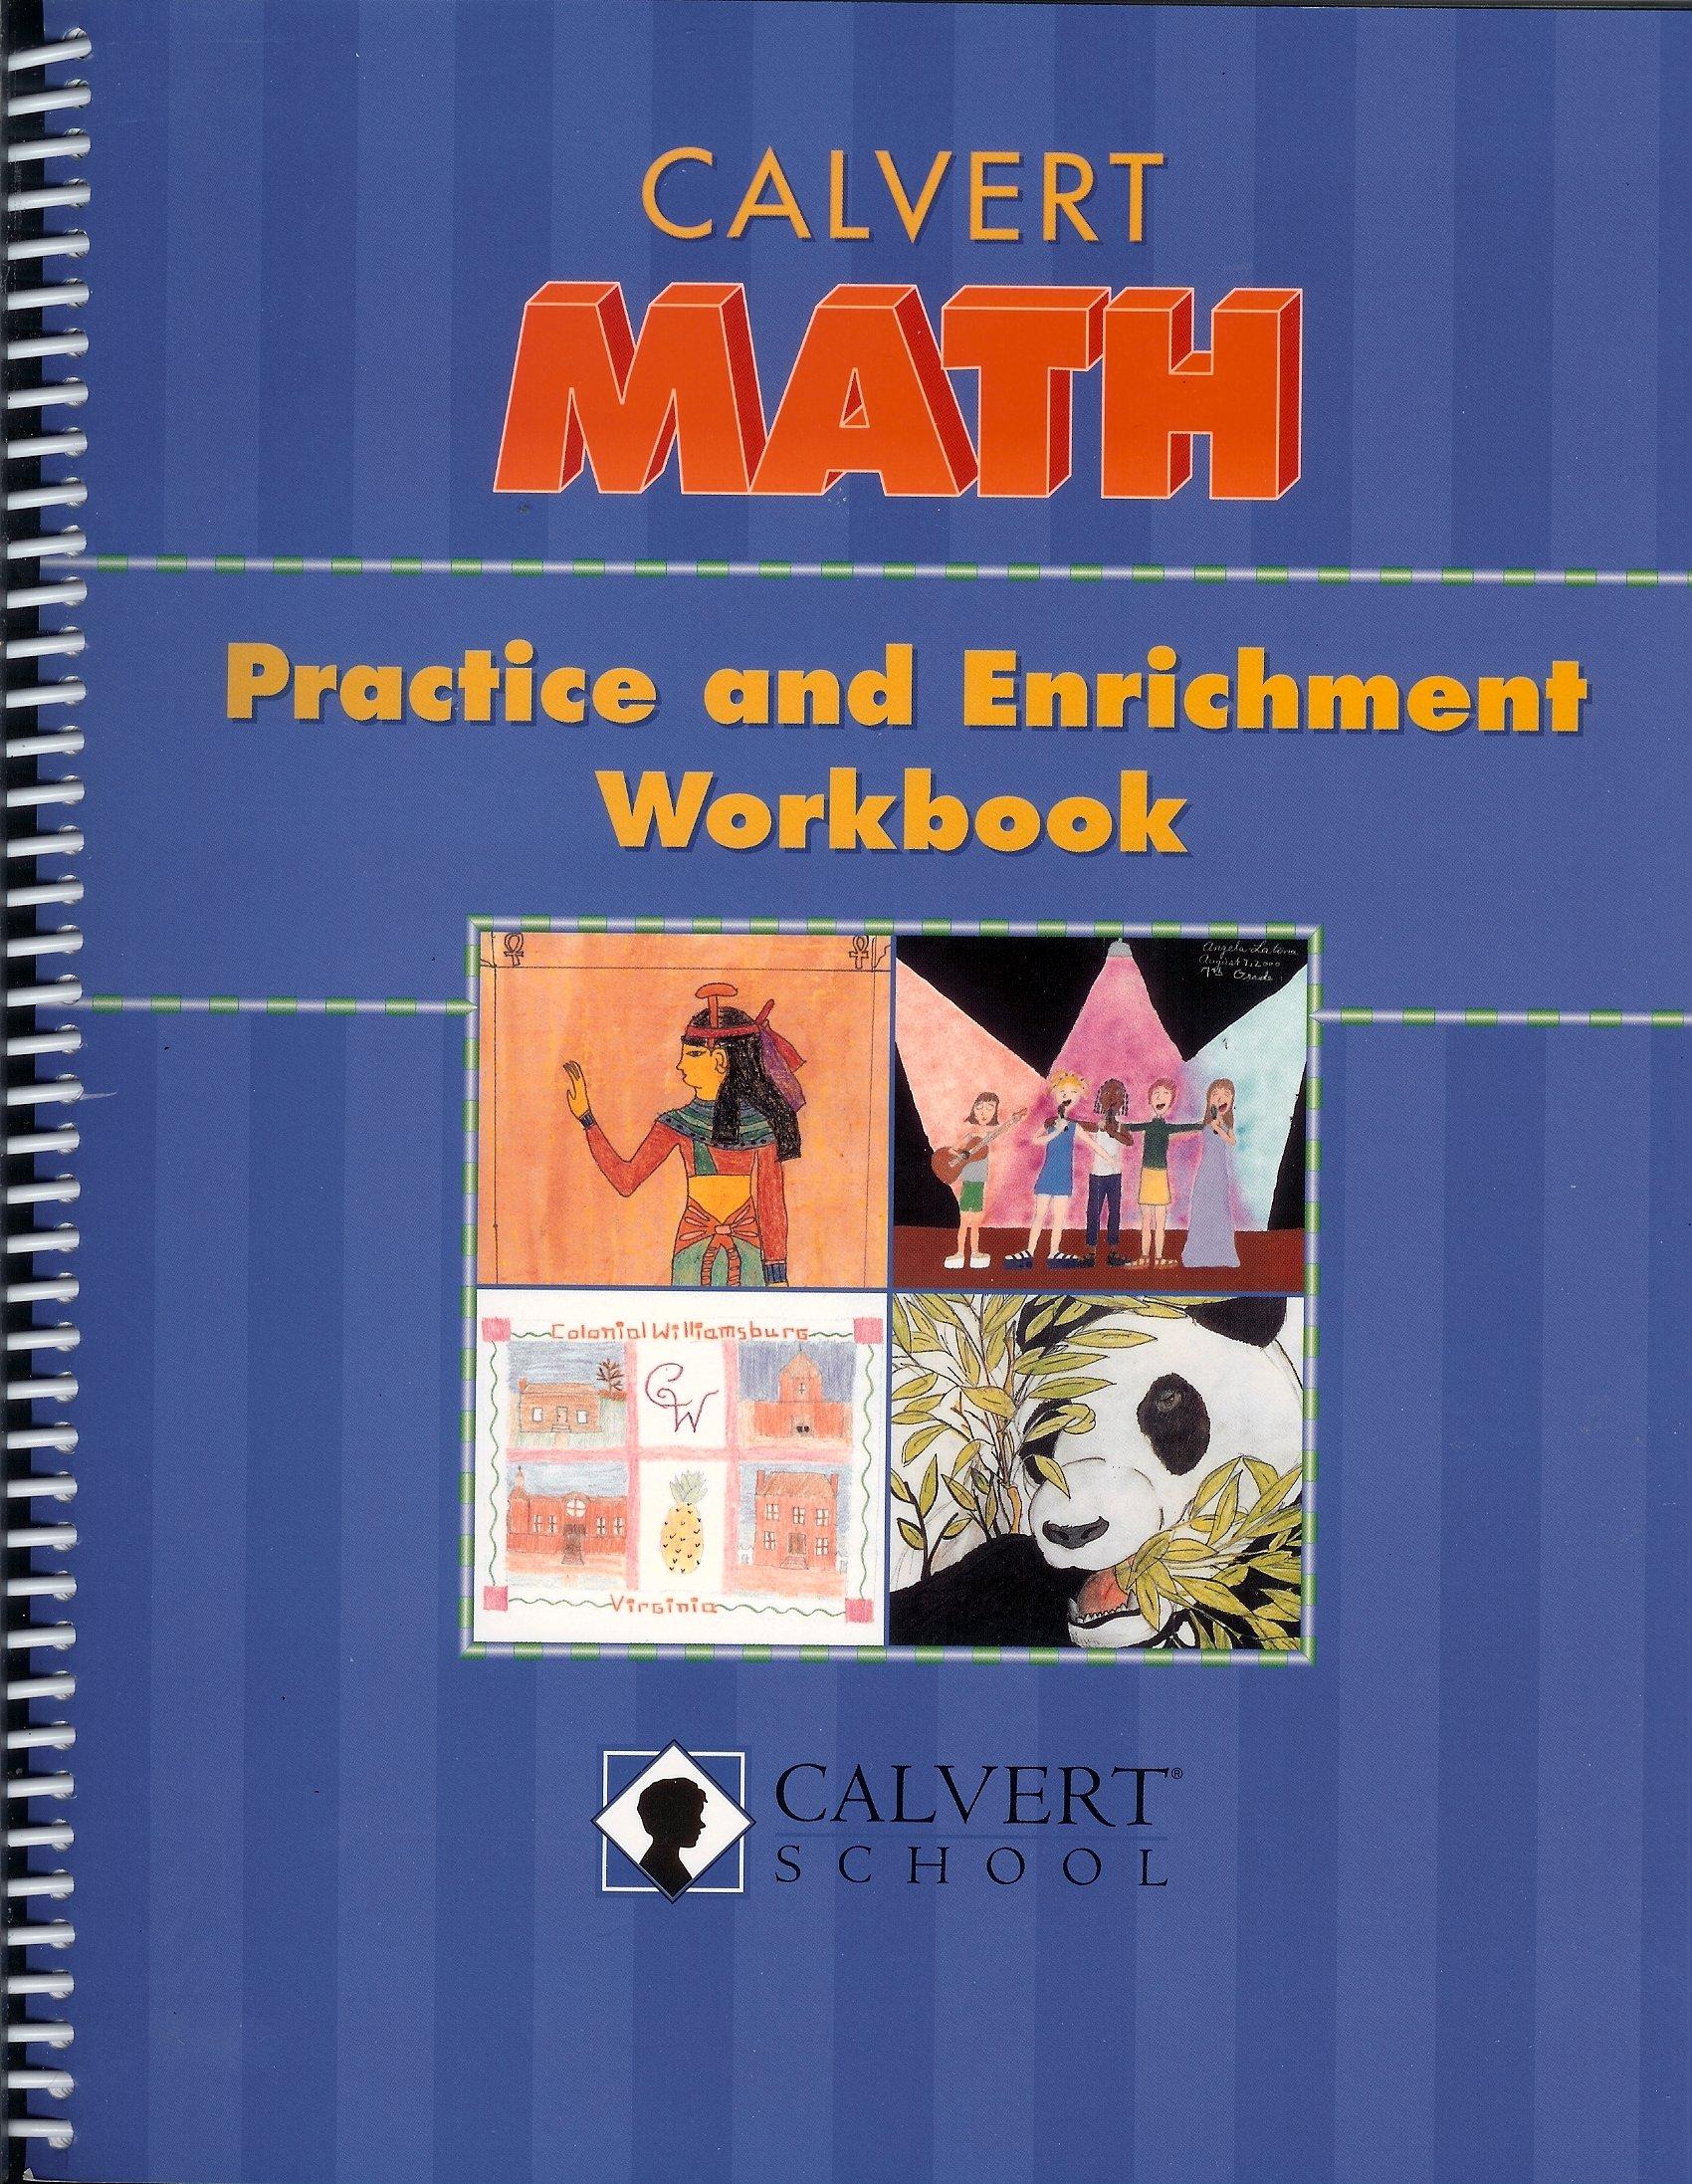 Calvert Math Practice and Enrichment Workbook (7th grade) (Calvert Math, 7th Grade) pdf